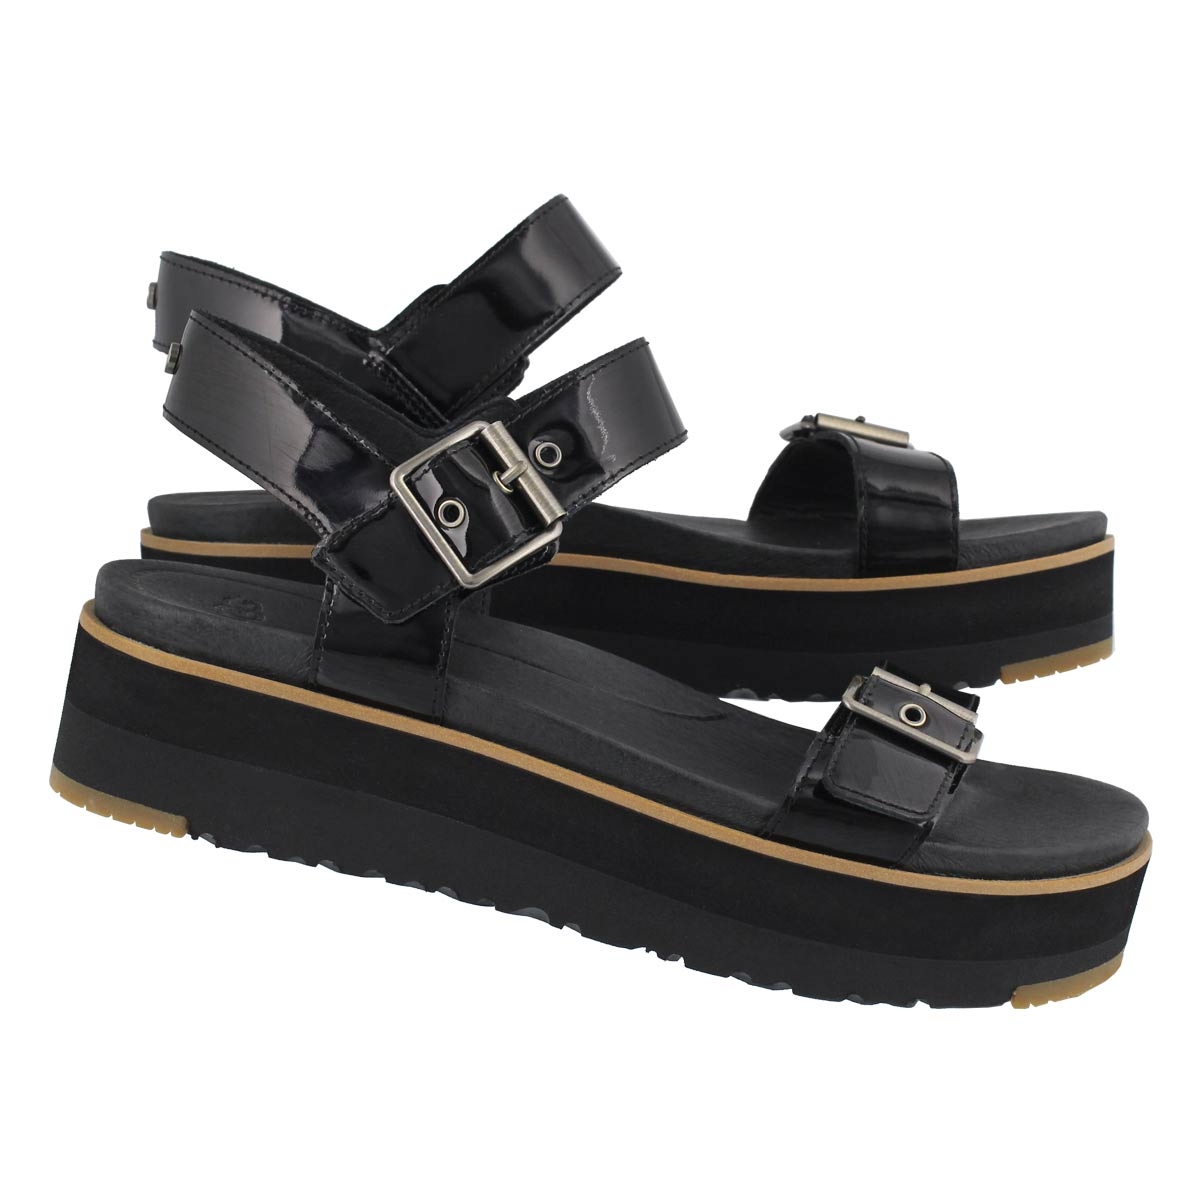 Lds Angie black casual platform sandal